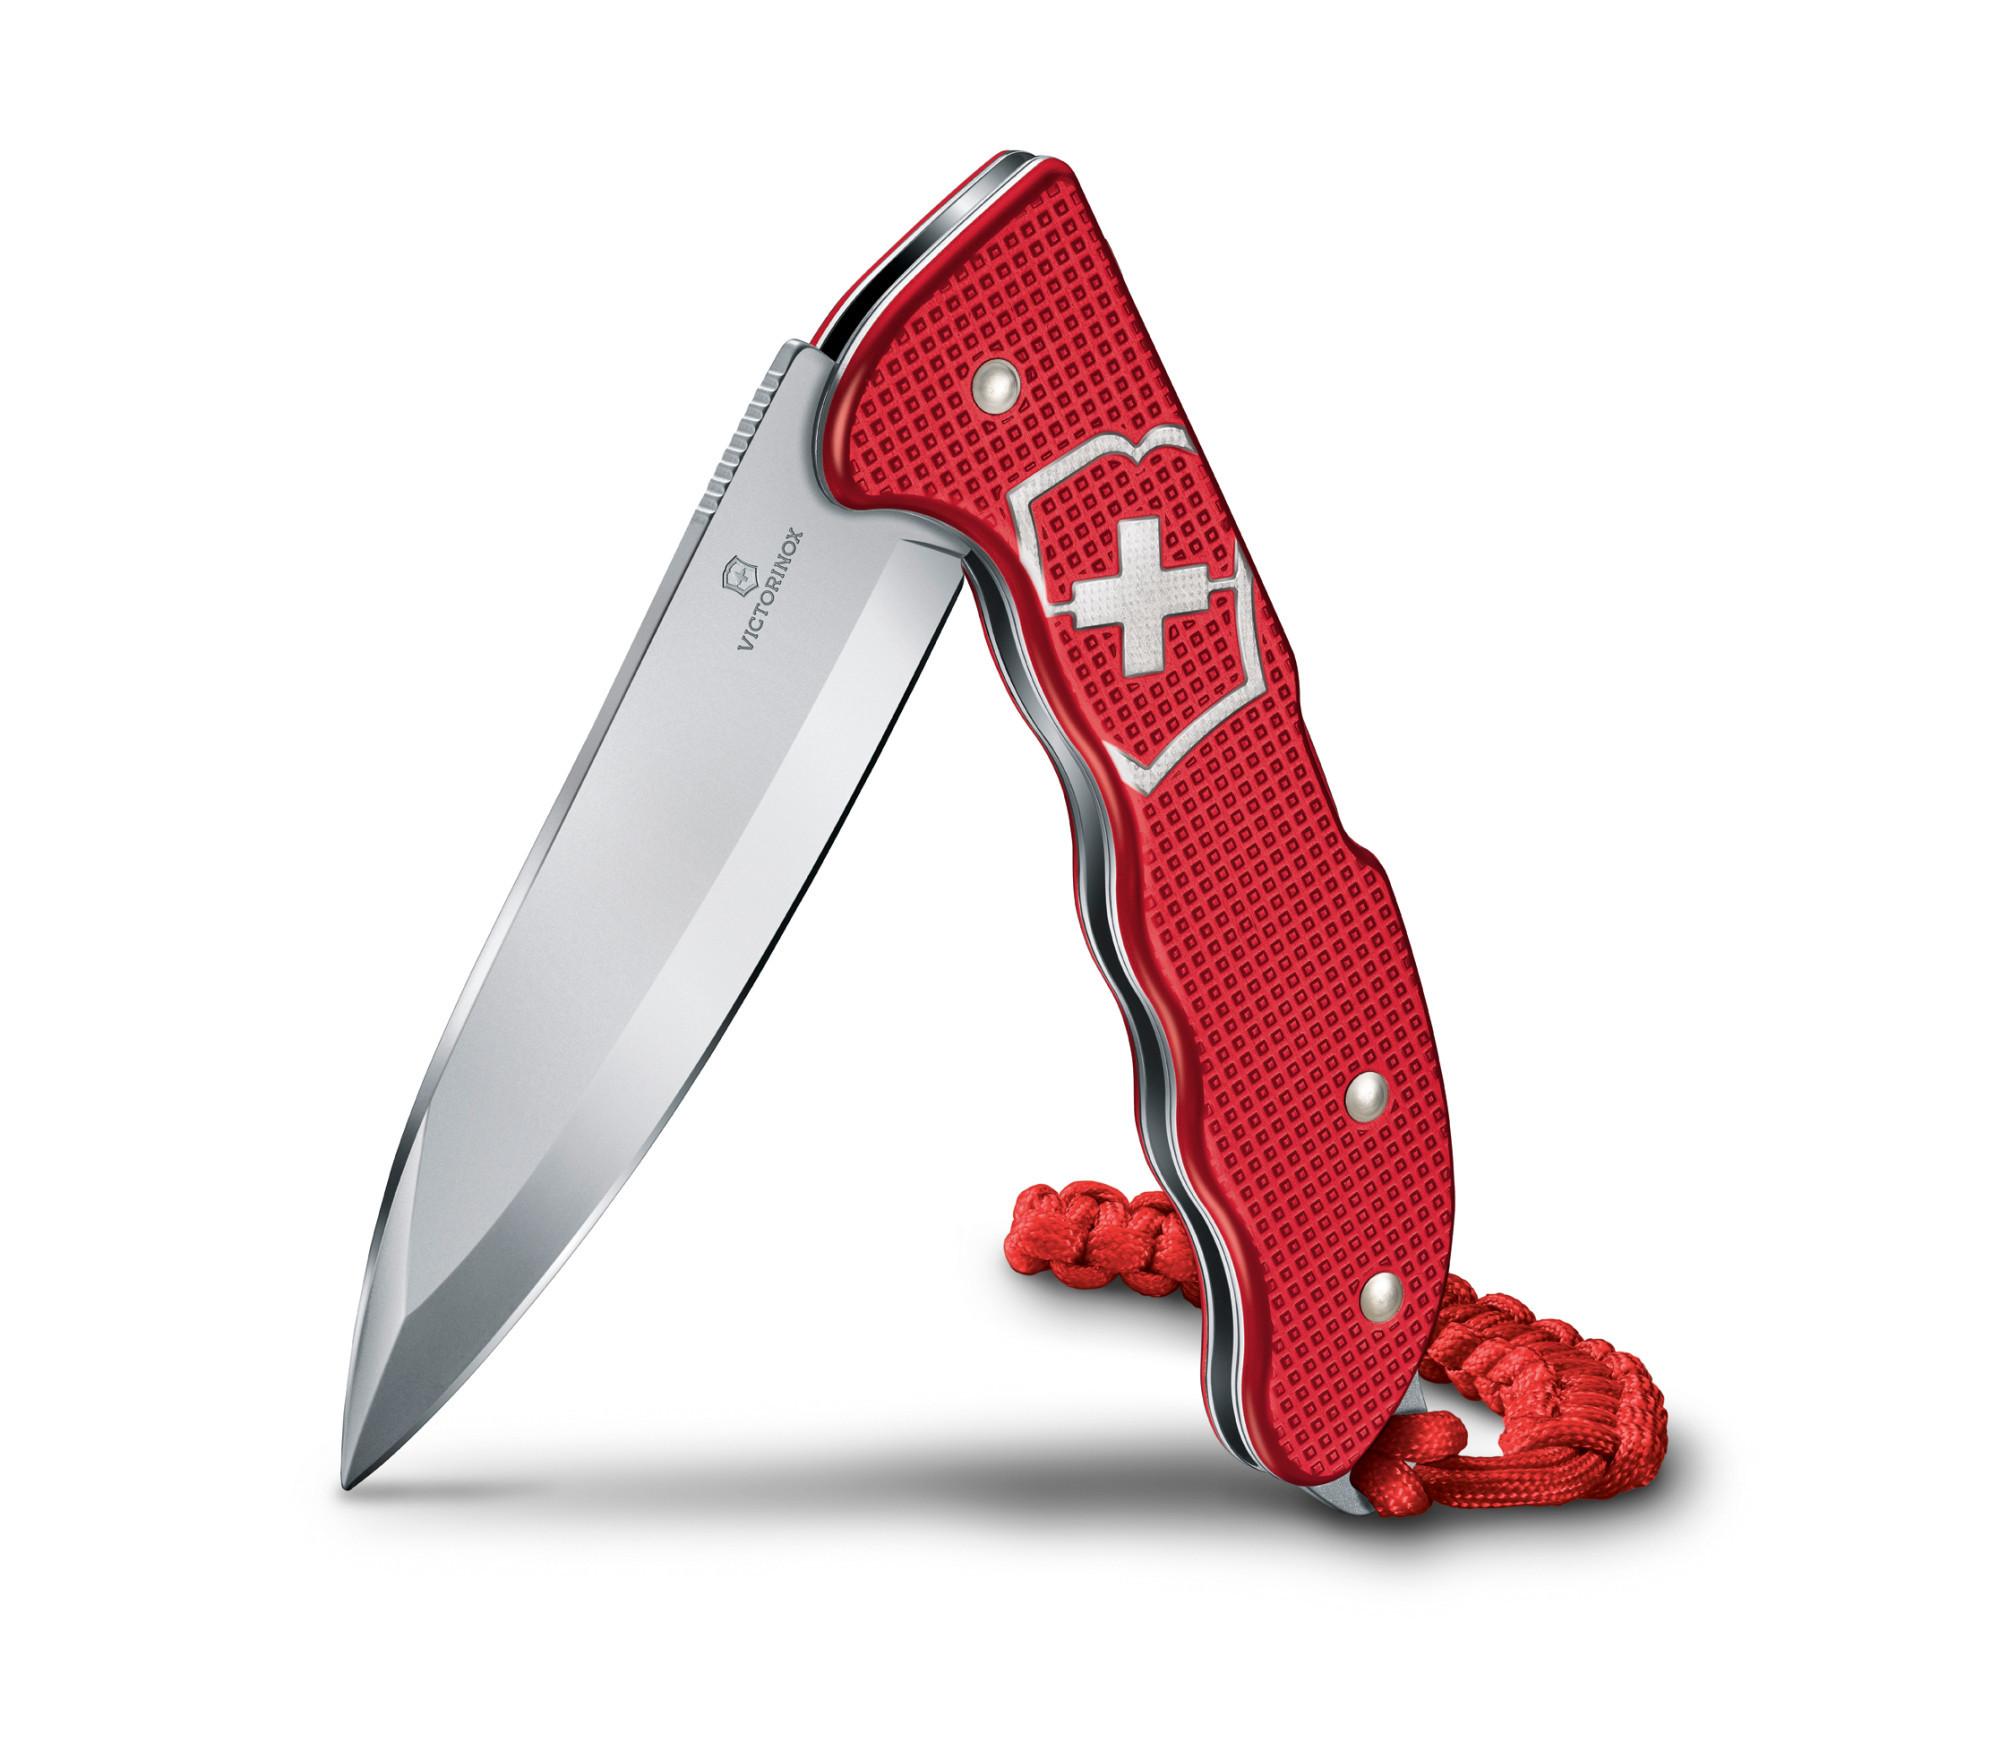 Складной швейцарский нож Victorinox Hunter Pro Alox Red, цвет красный (0.9415.20) - Wenger-Victorinox.Ru